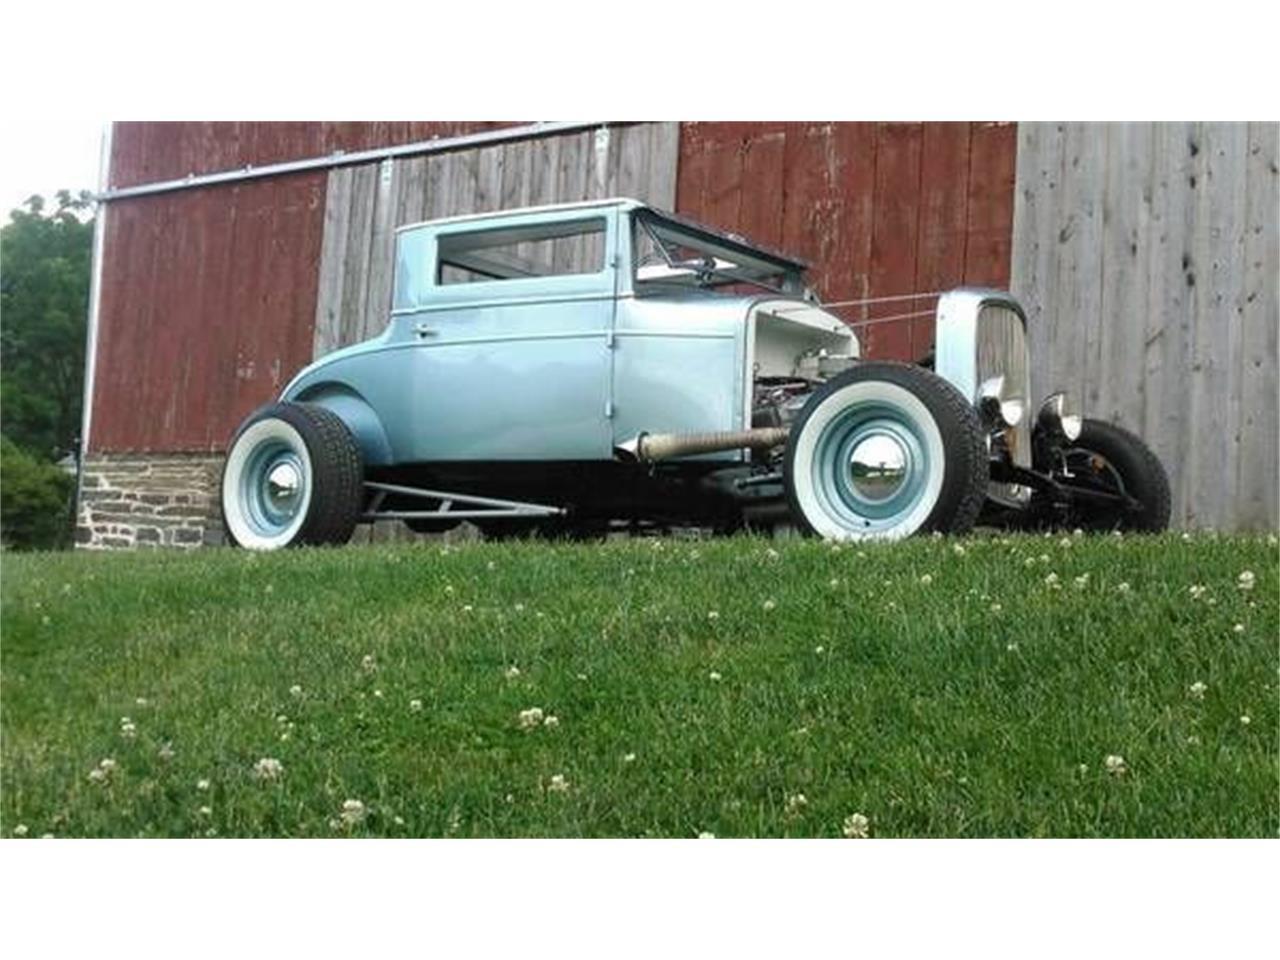 for sale 1928 dodge custom in cadillac, michigan cars - cadillac, mi at geebo